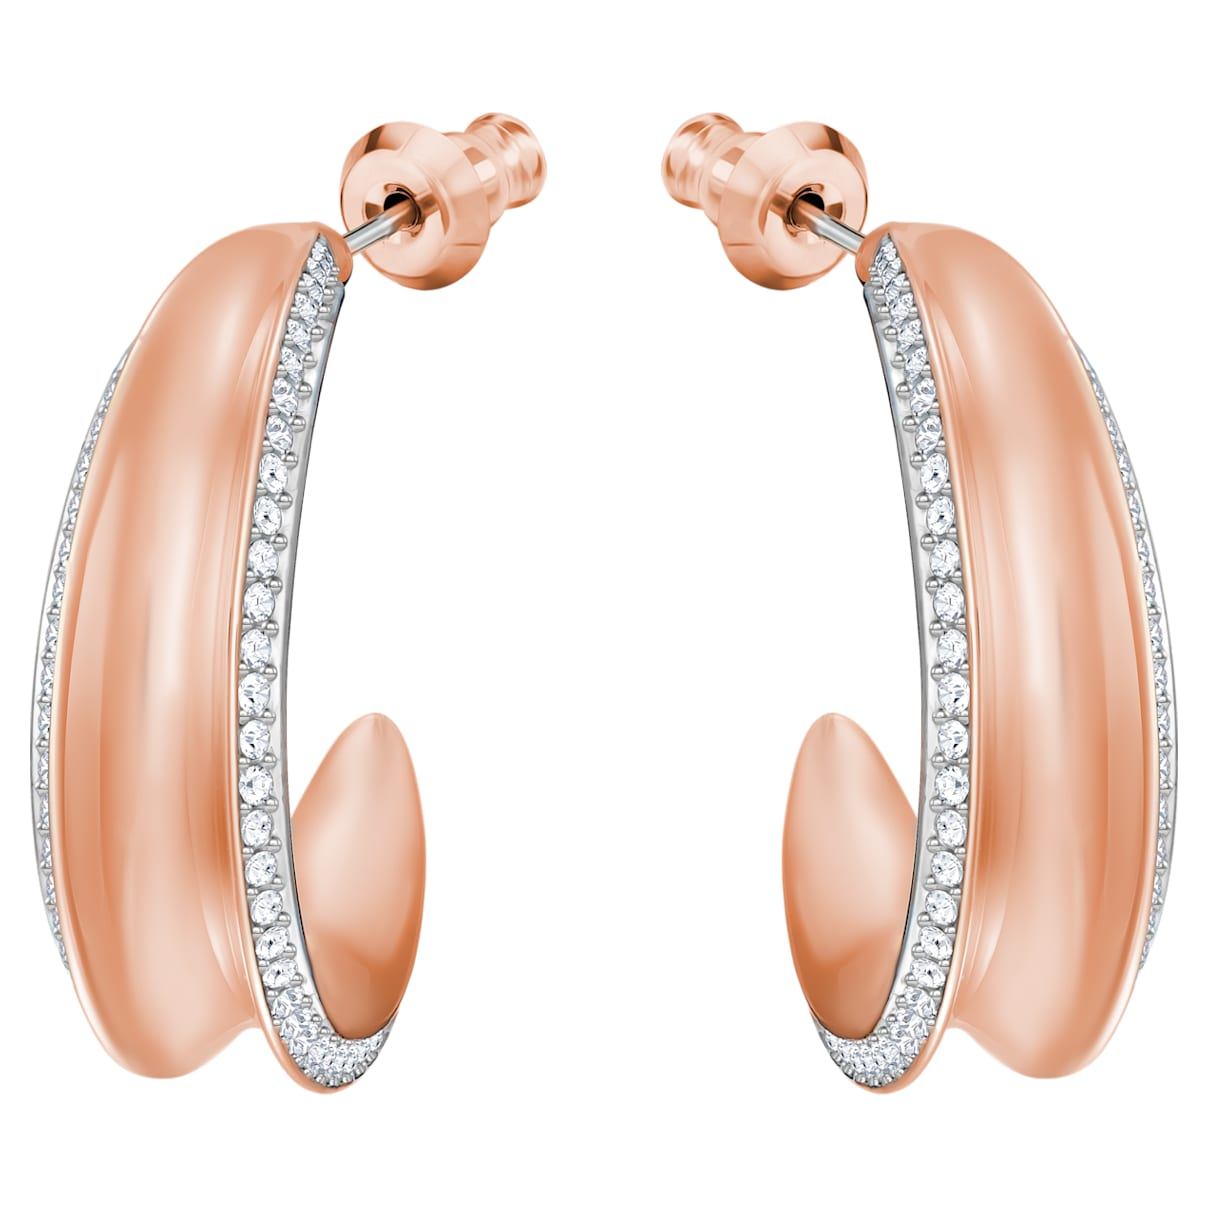 Lakeside Hoop Pierced Earrings, White, Rose-gold tone plated